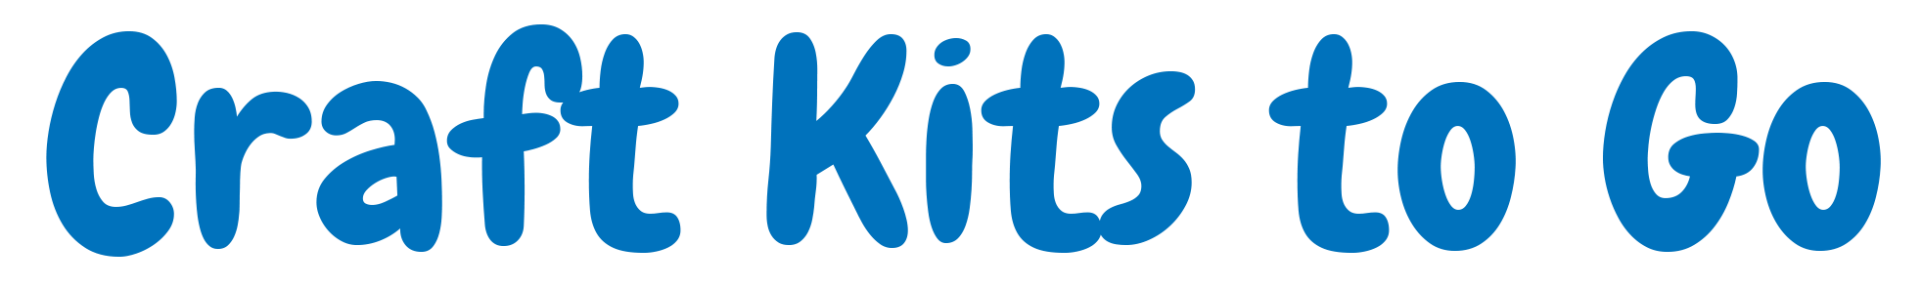 Craft Kits to Go logo